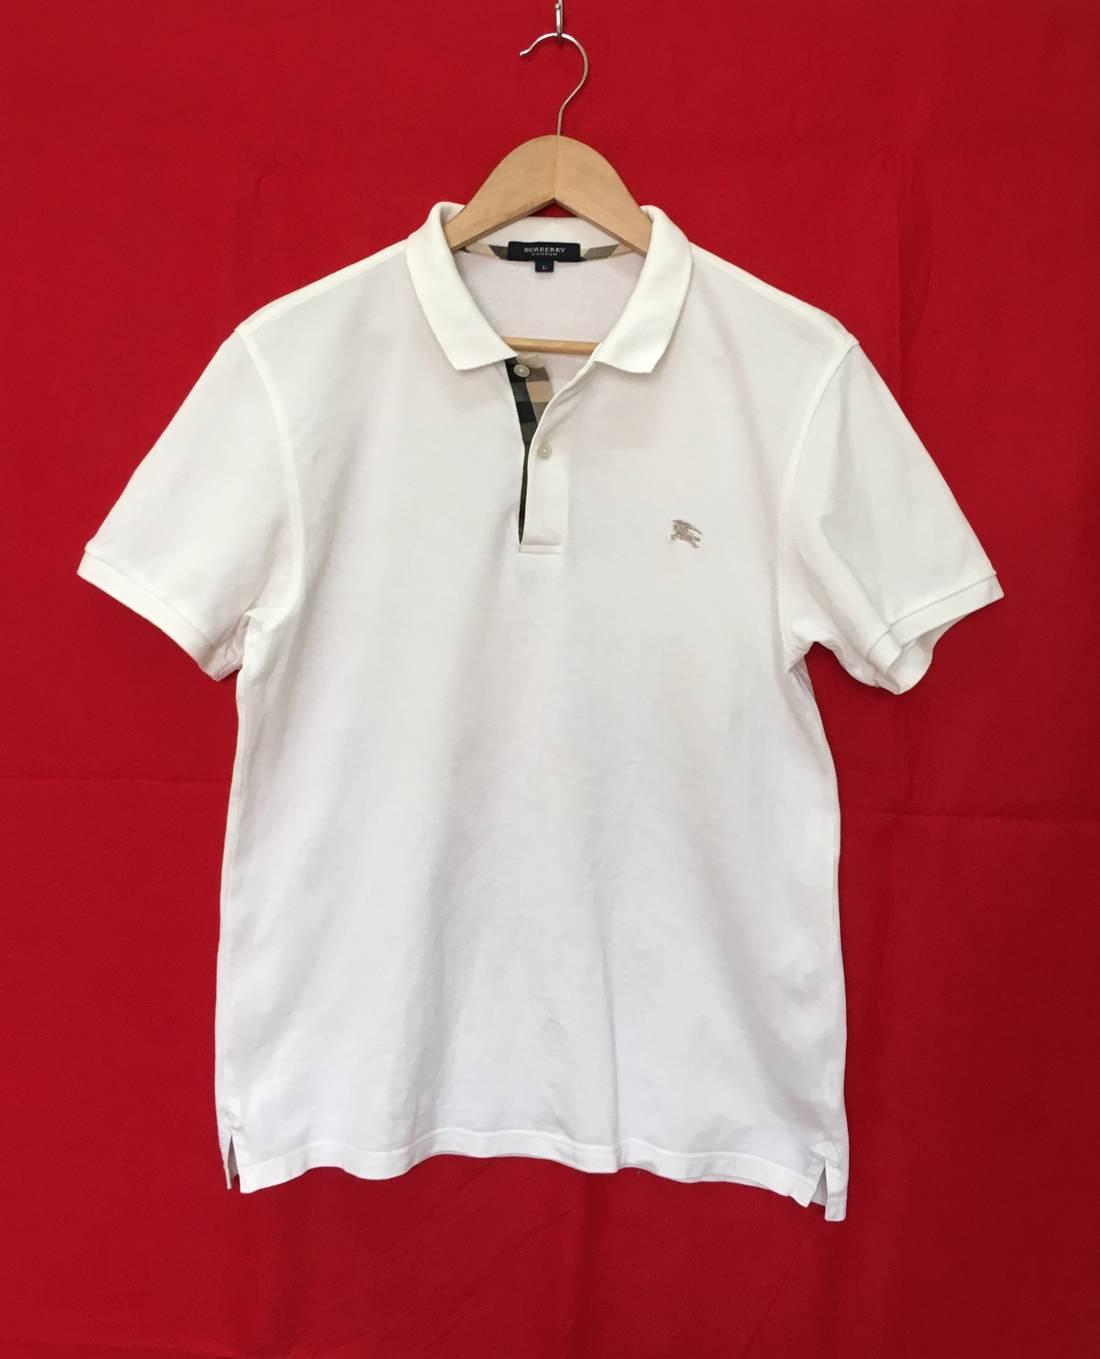 7091c53a914 Burberry London Polo Shirt Price